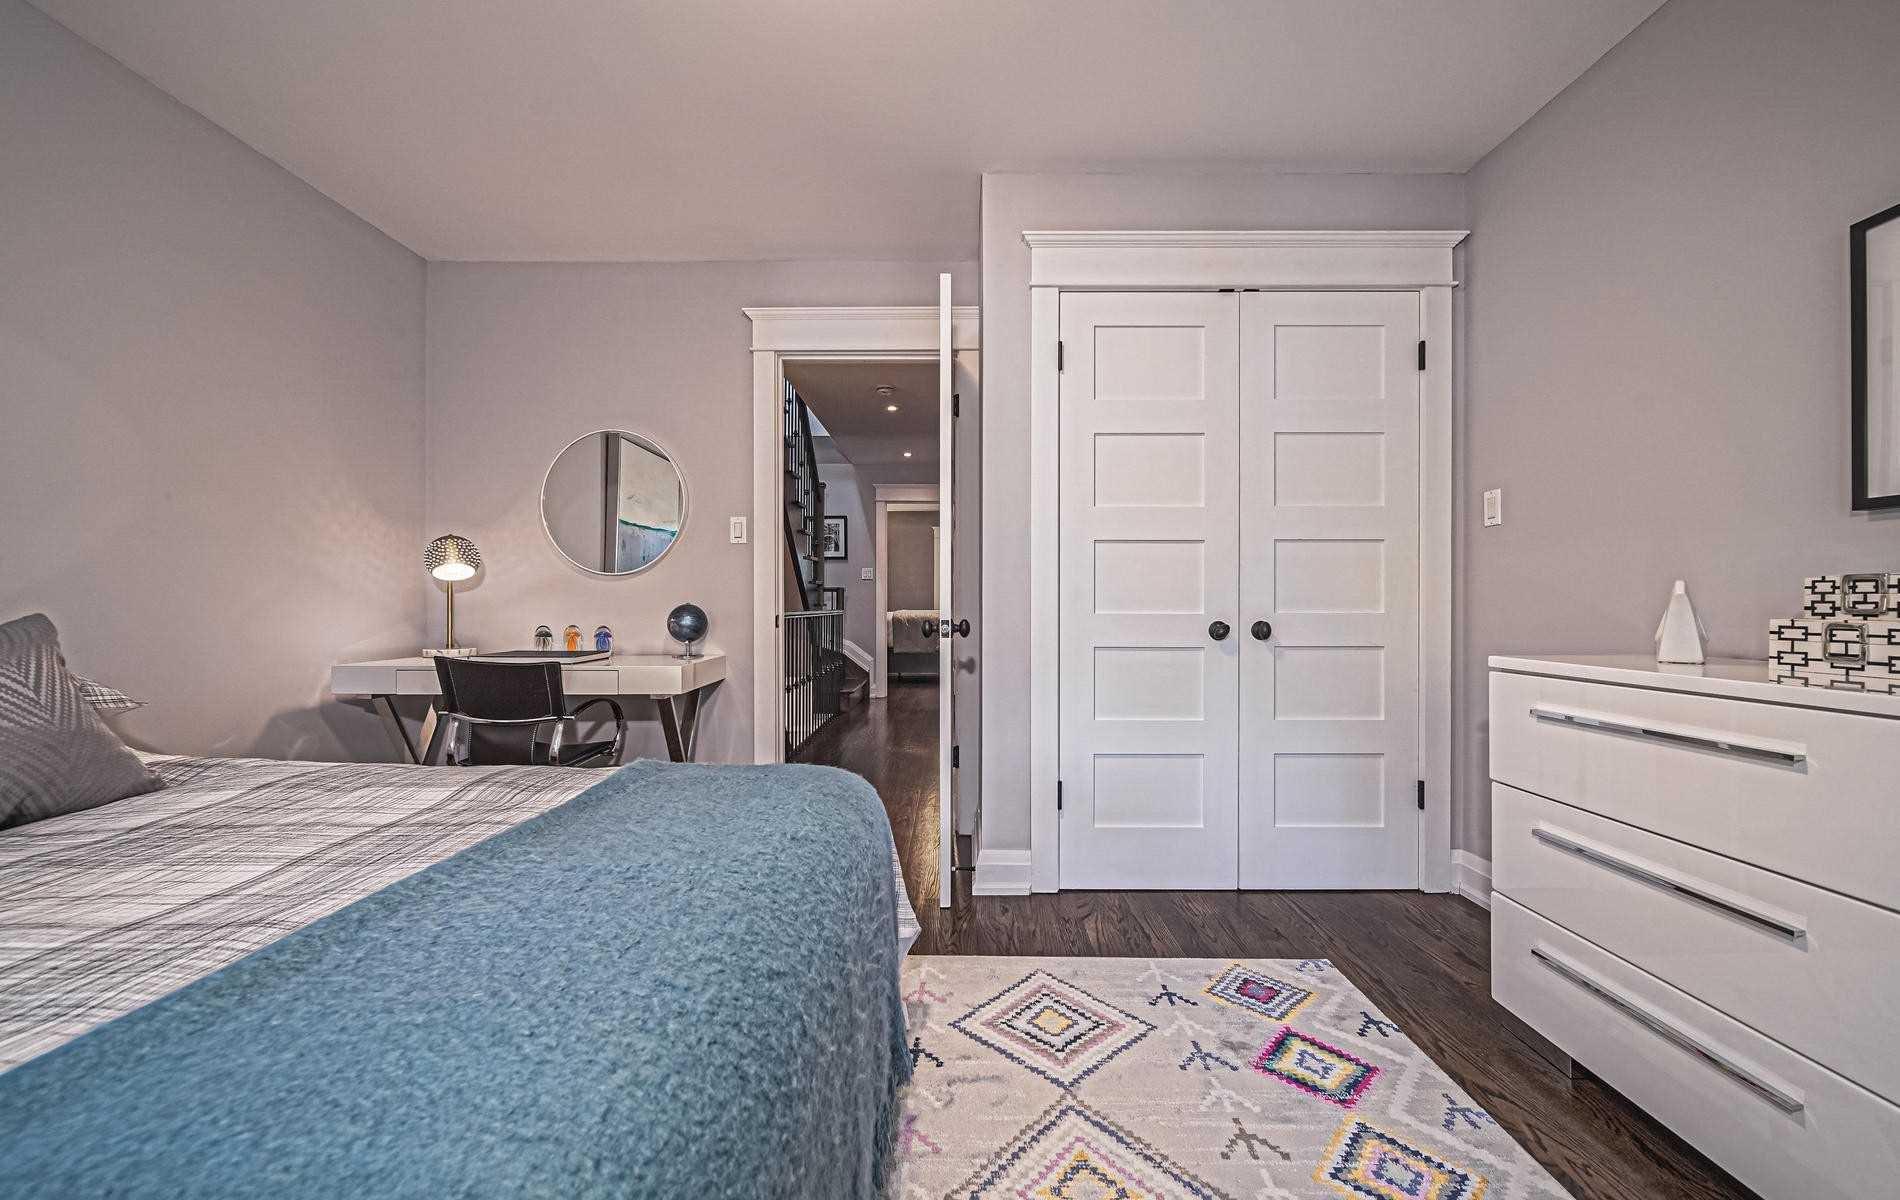 Photo 9: Photos: 216A Hamilton Street in Toronto: South Riverdale House (3-Storey) for sale (Toronto E01)  : MLS®# E4619870